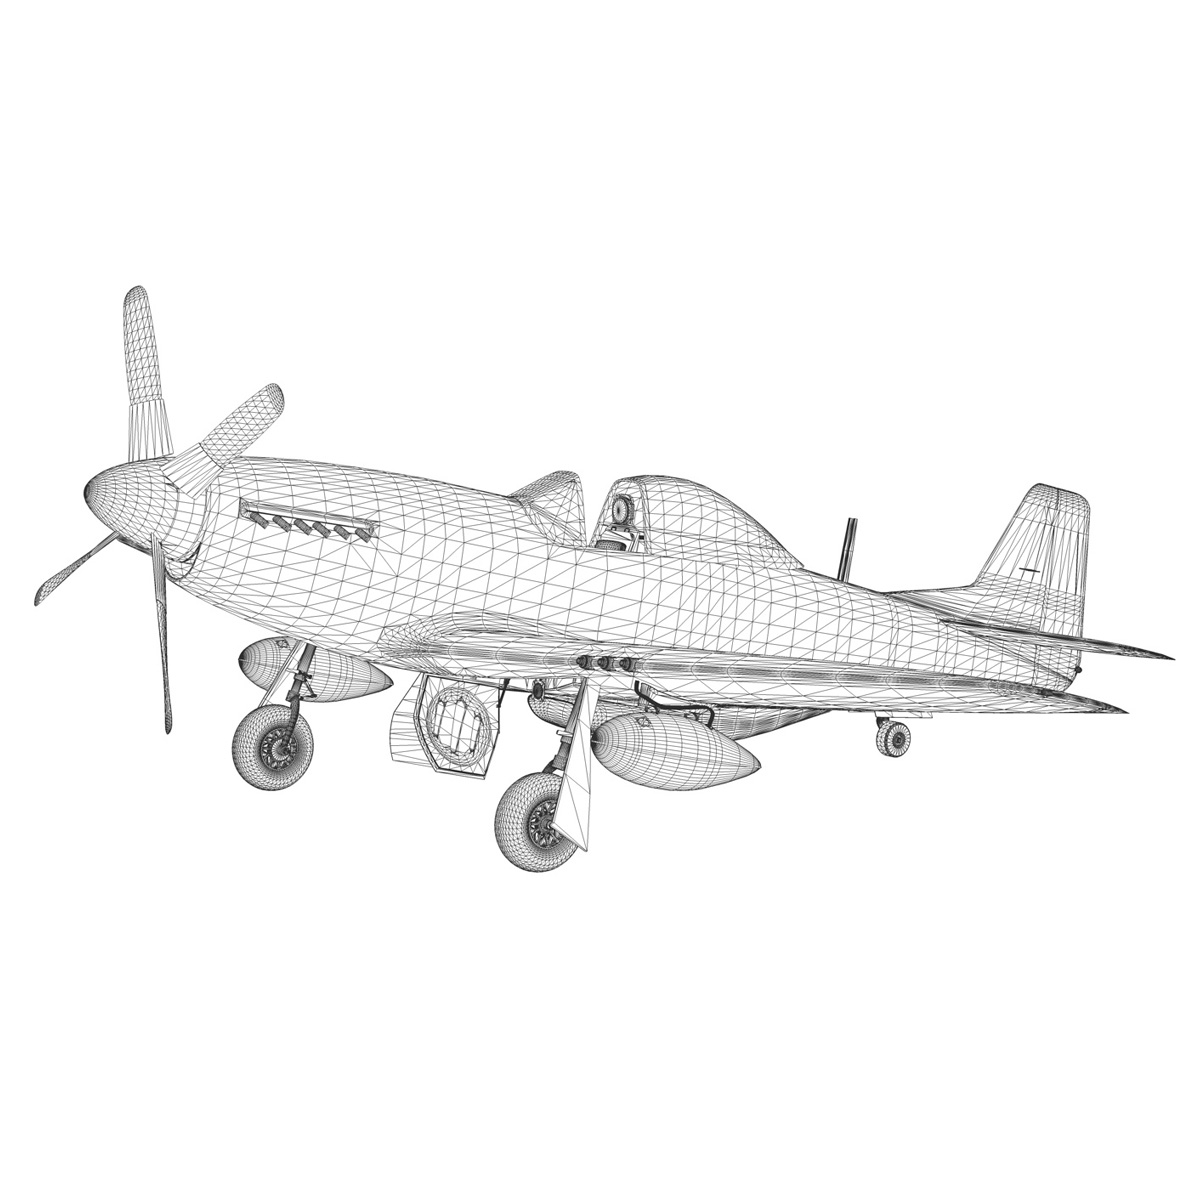 north american p-51d mustang – petie 3rd 3d model fbx c4d lwo obj 280146